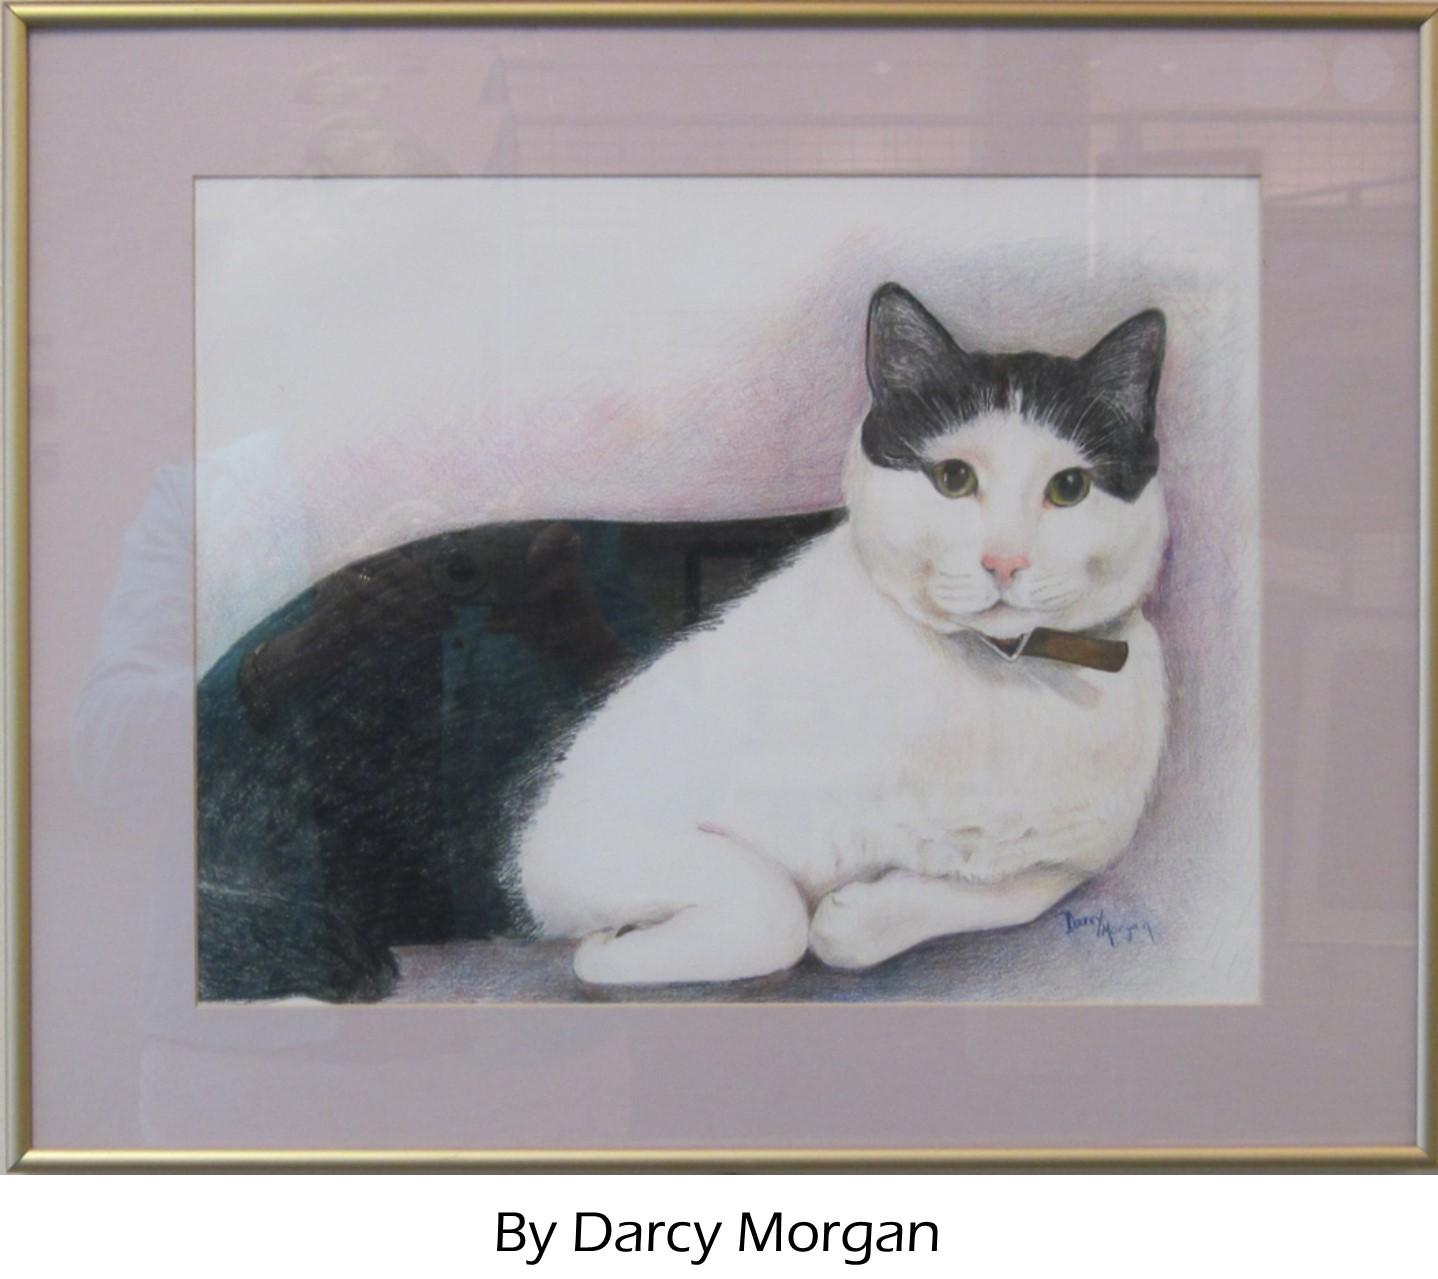 Darcy c